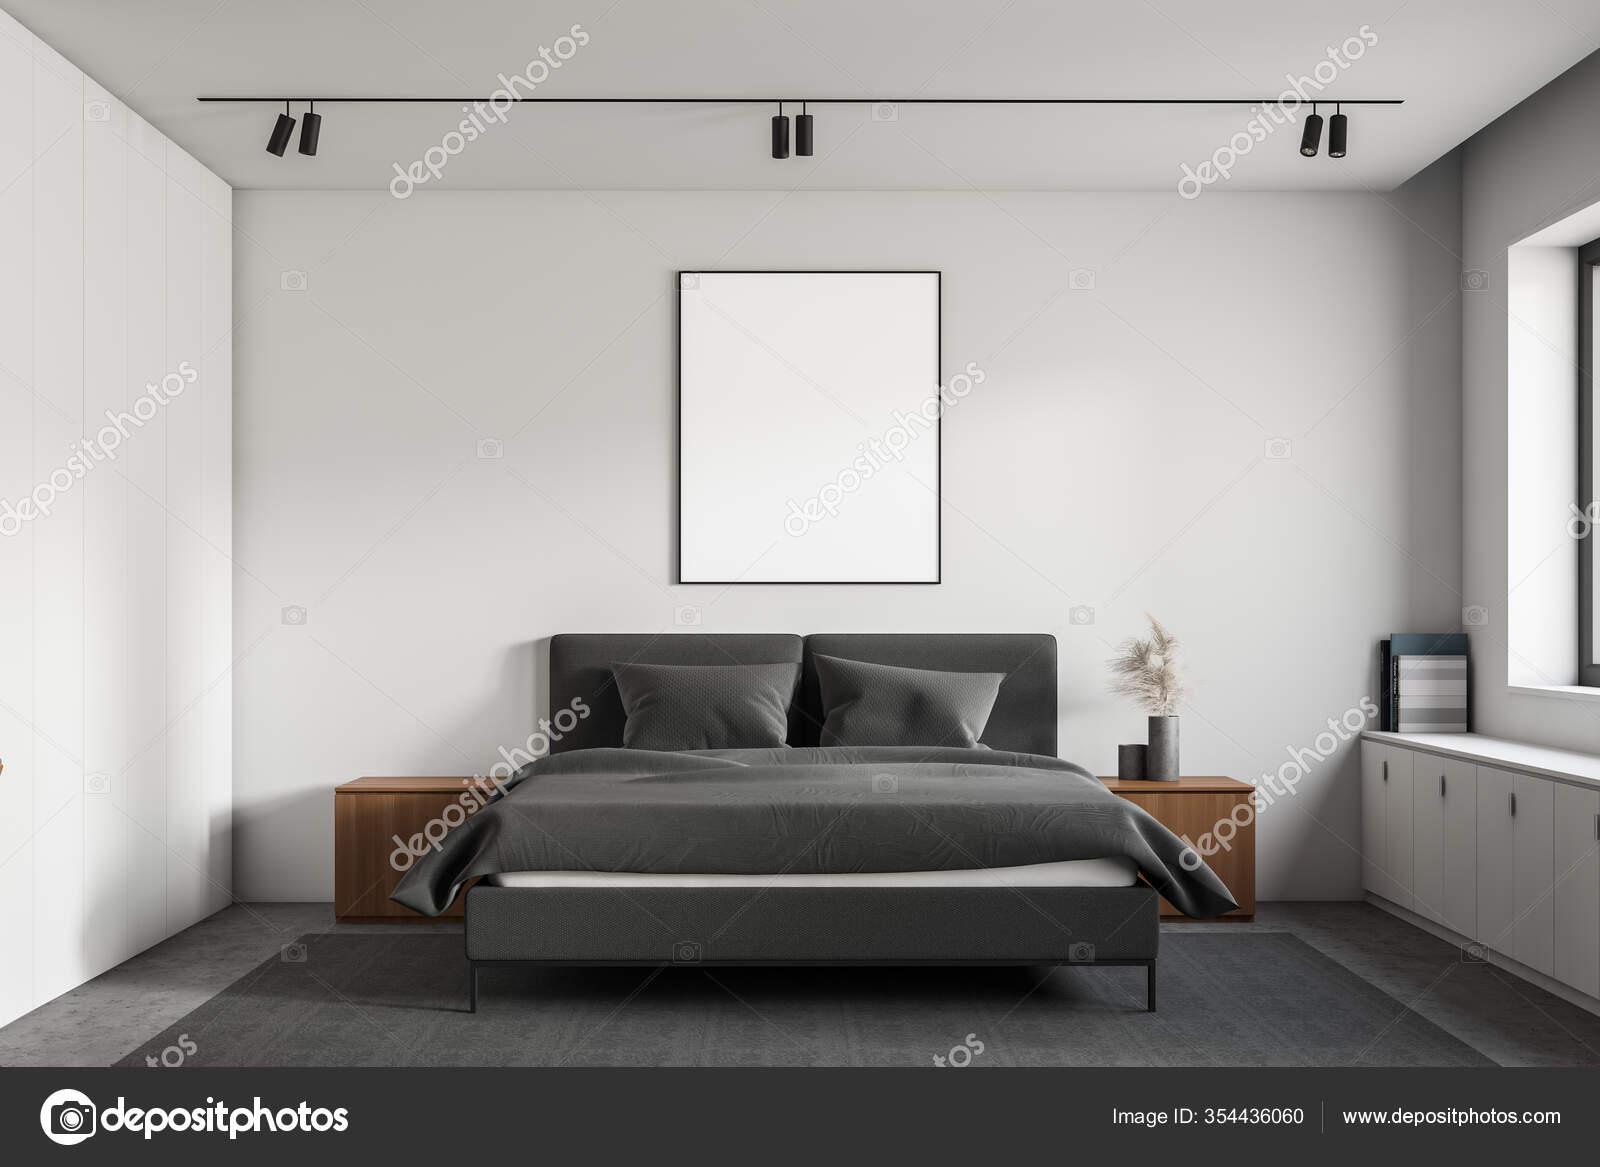 Interior Minimalistic Master Bedroom White Walls Concrete Floor Comfortable King Stock Photo C Denisismagilov 354436060